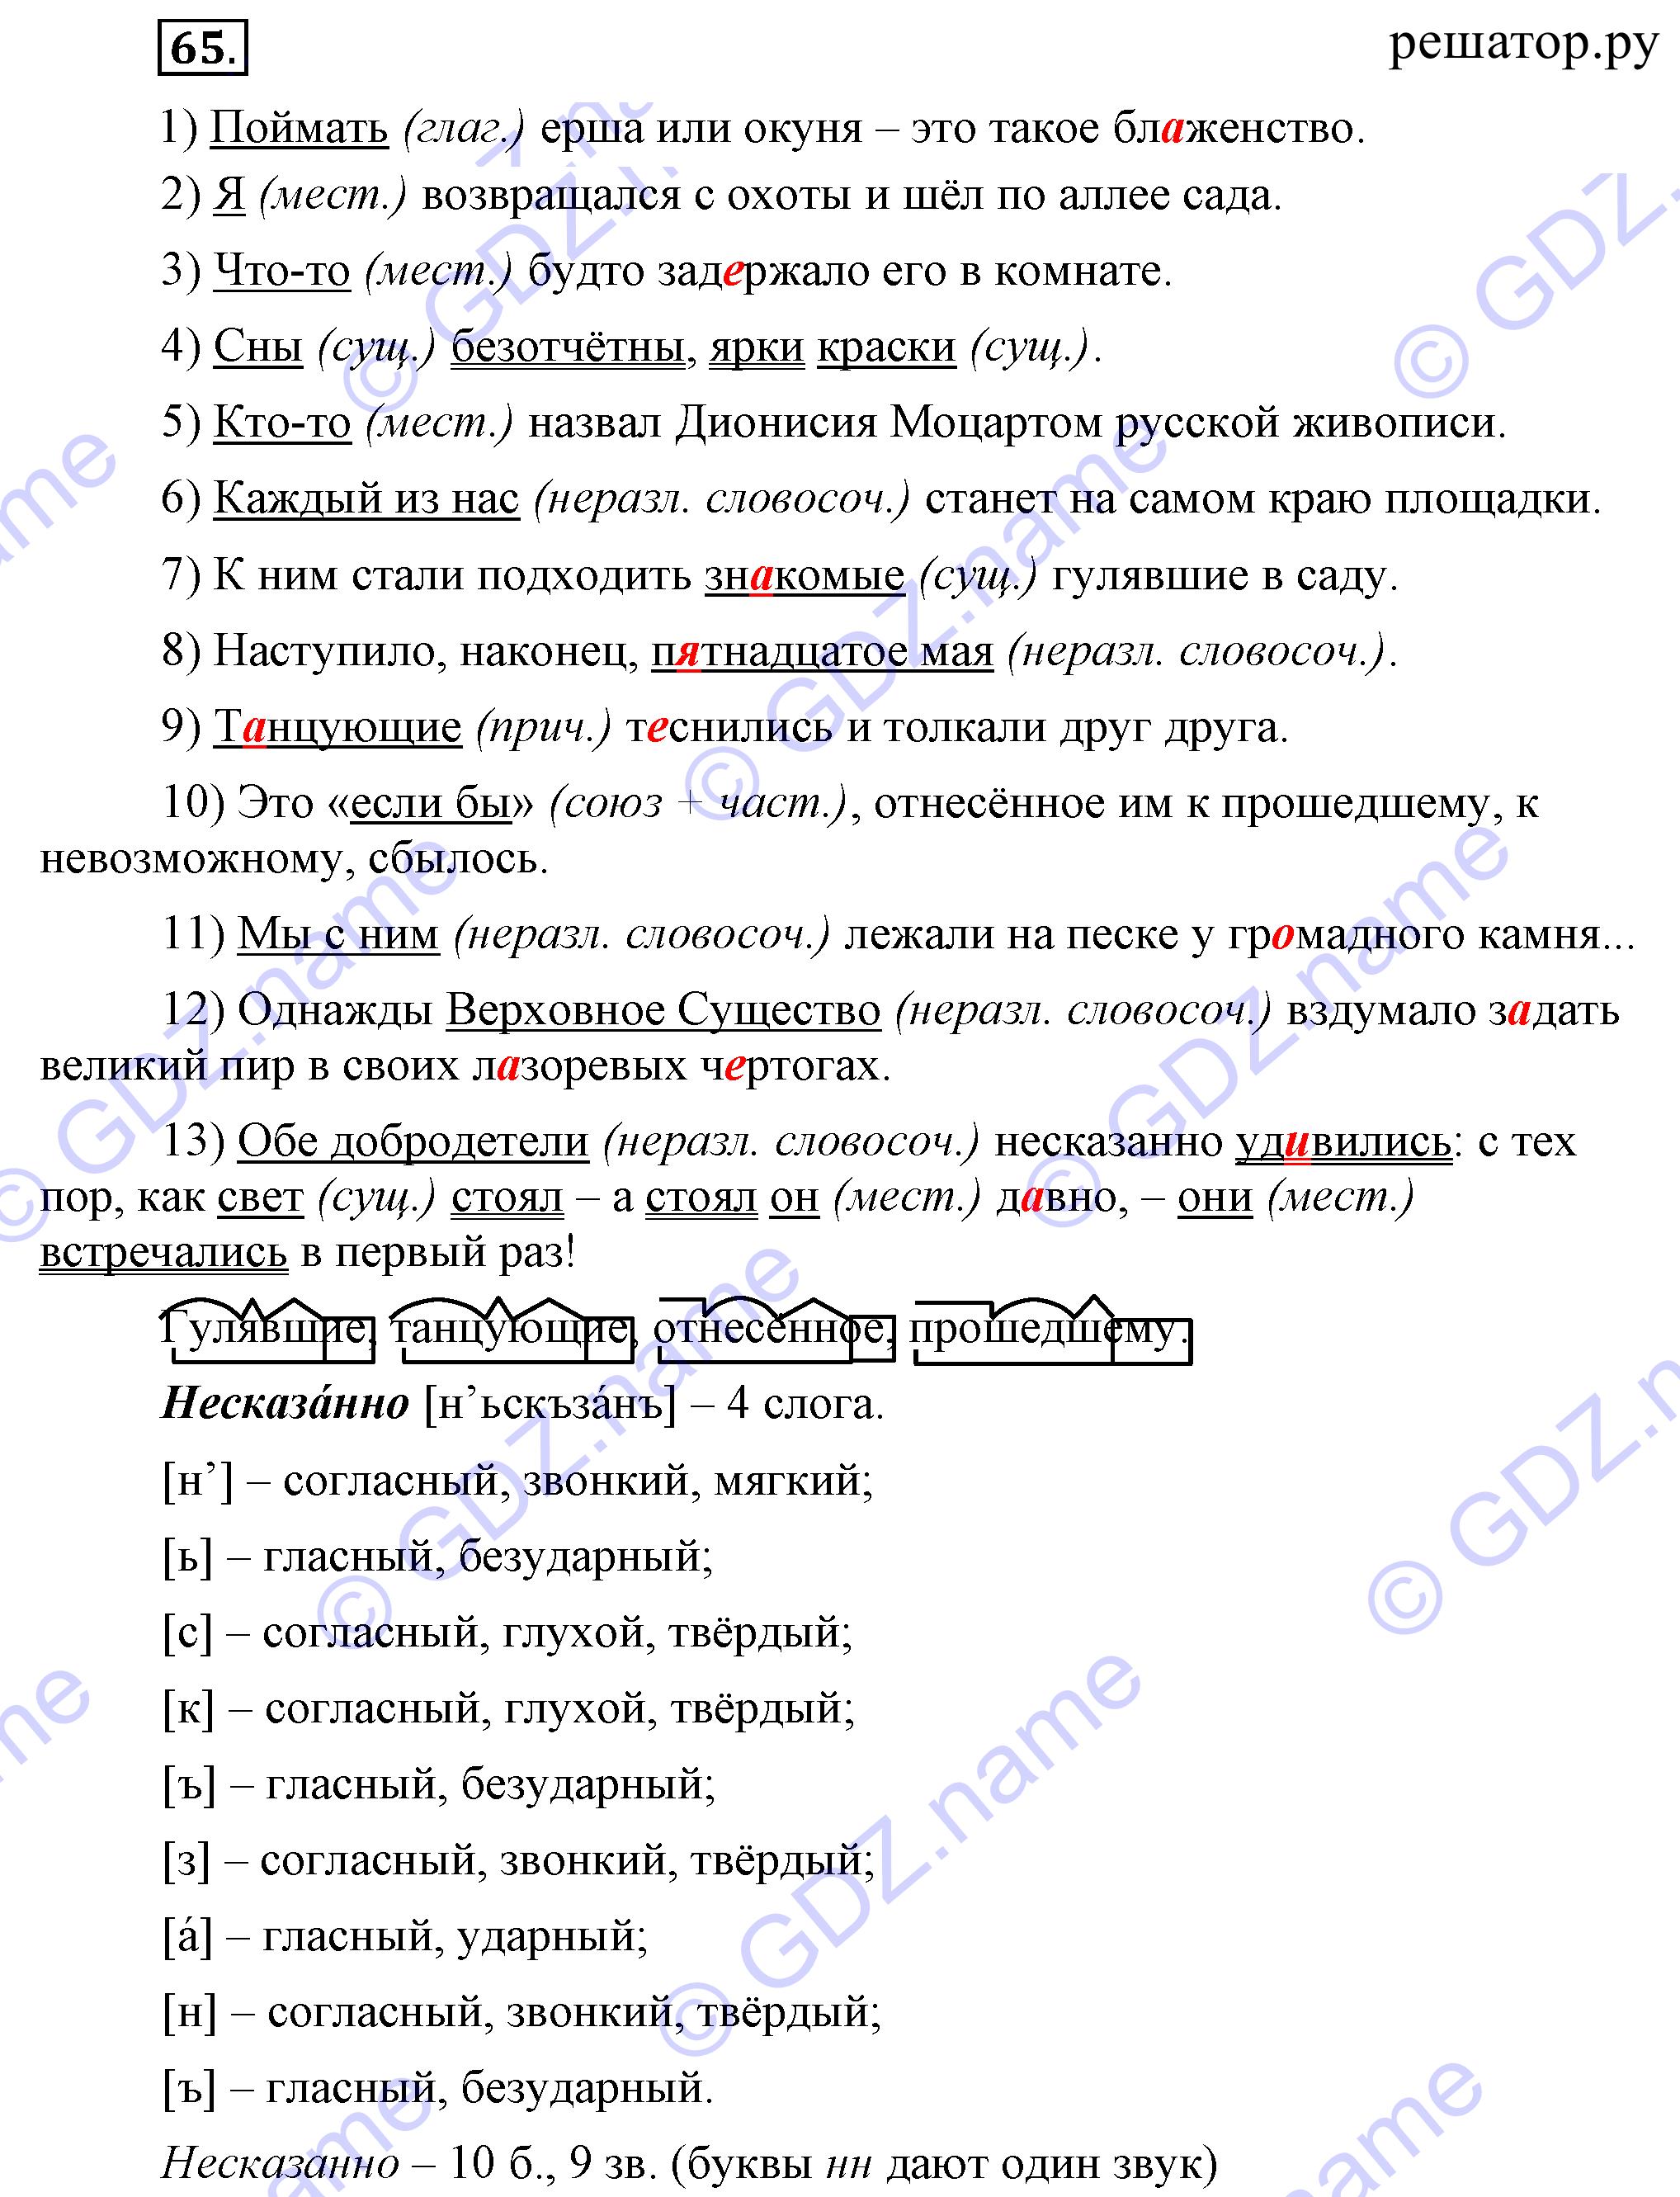 Гдз по русскому языку 8 класс разумовская 2018 год